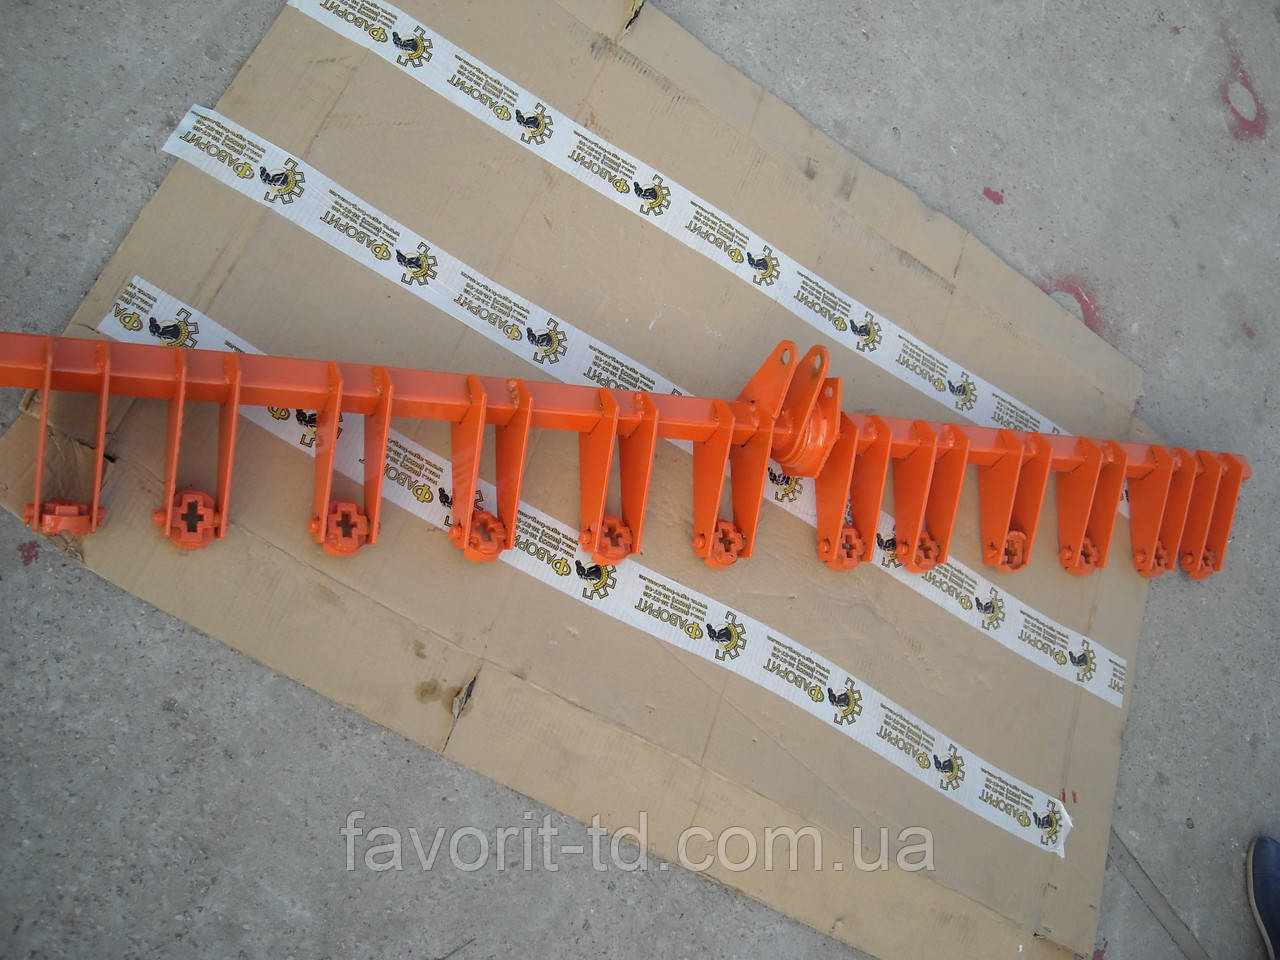 Вал подйома сошников ОЗШ 00.340Б сеялки СЗ-5,4